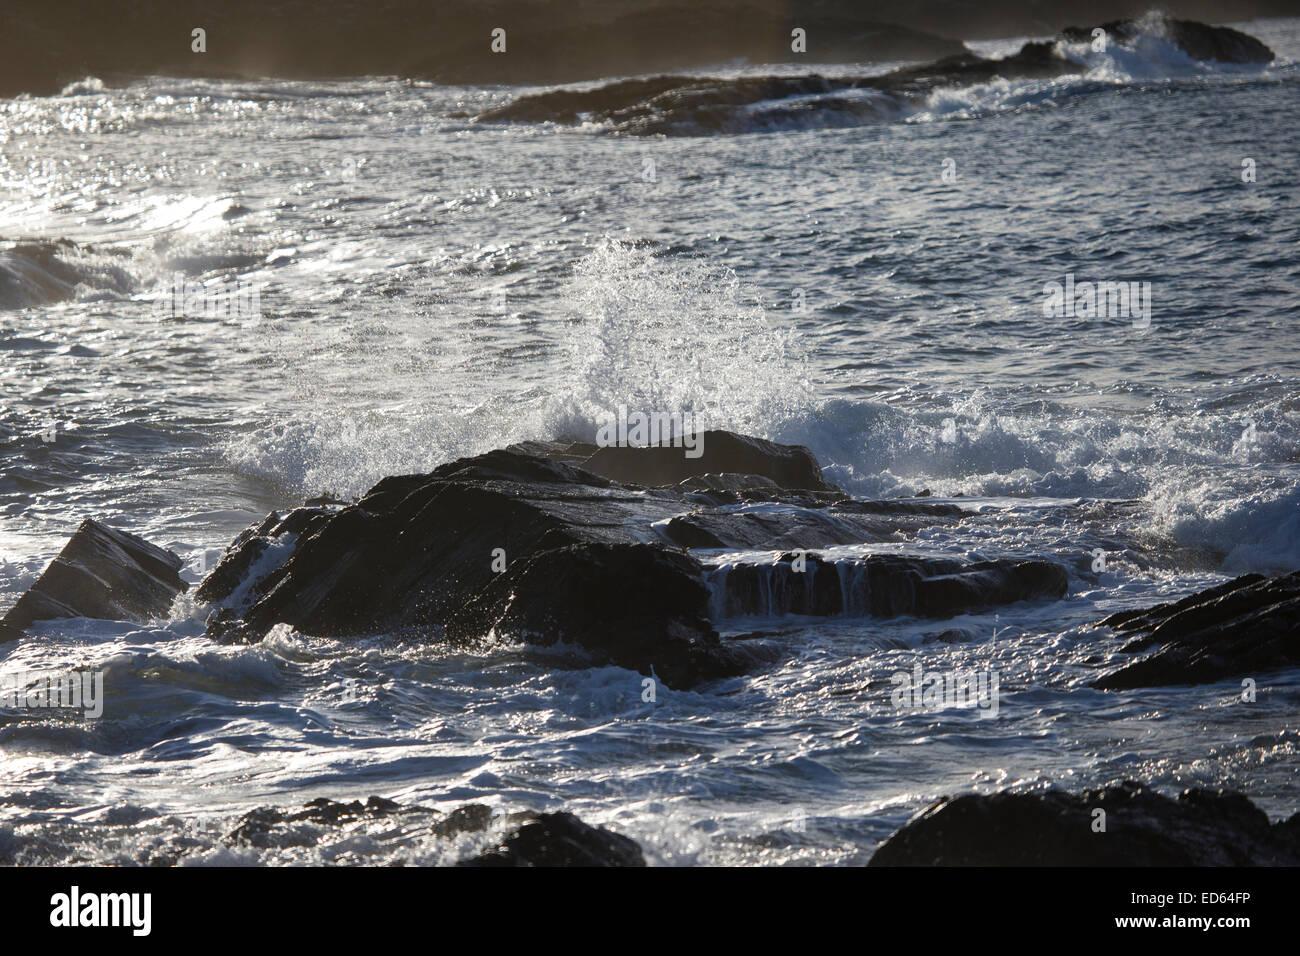 Coastal waves backlit and breaking against the rugged rocks on the Scottish western coast - Stock Image